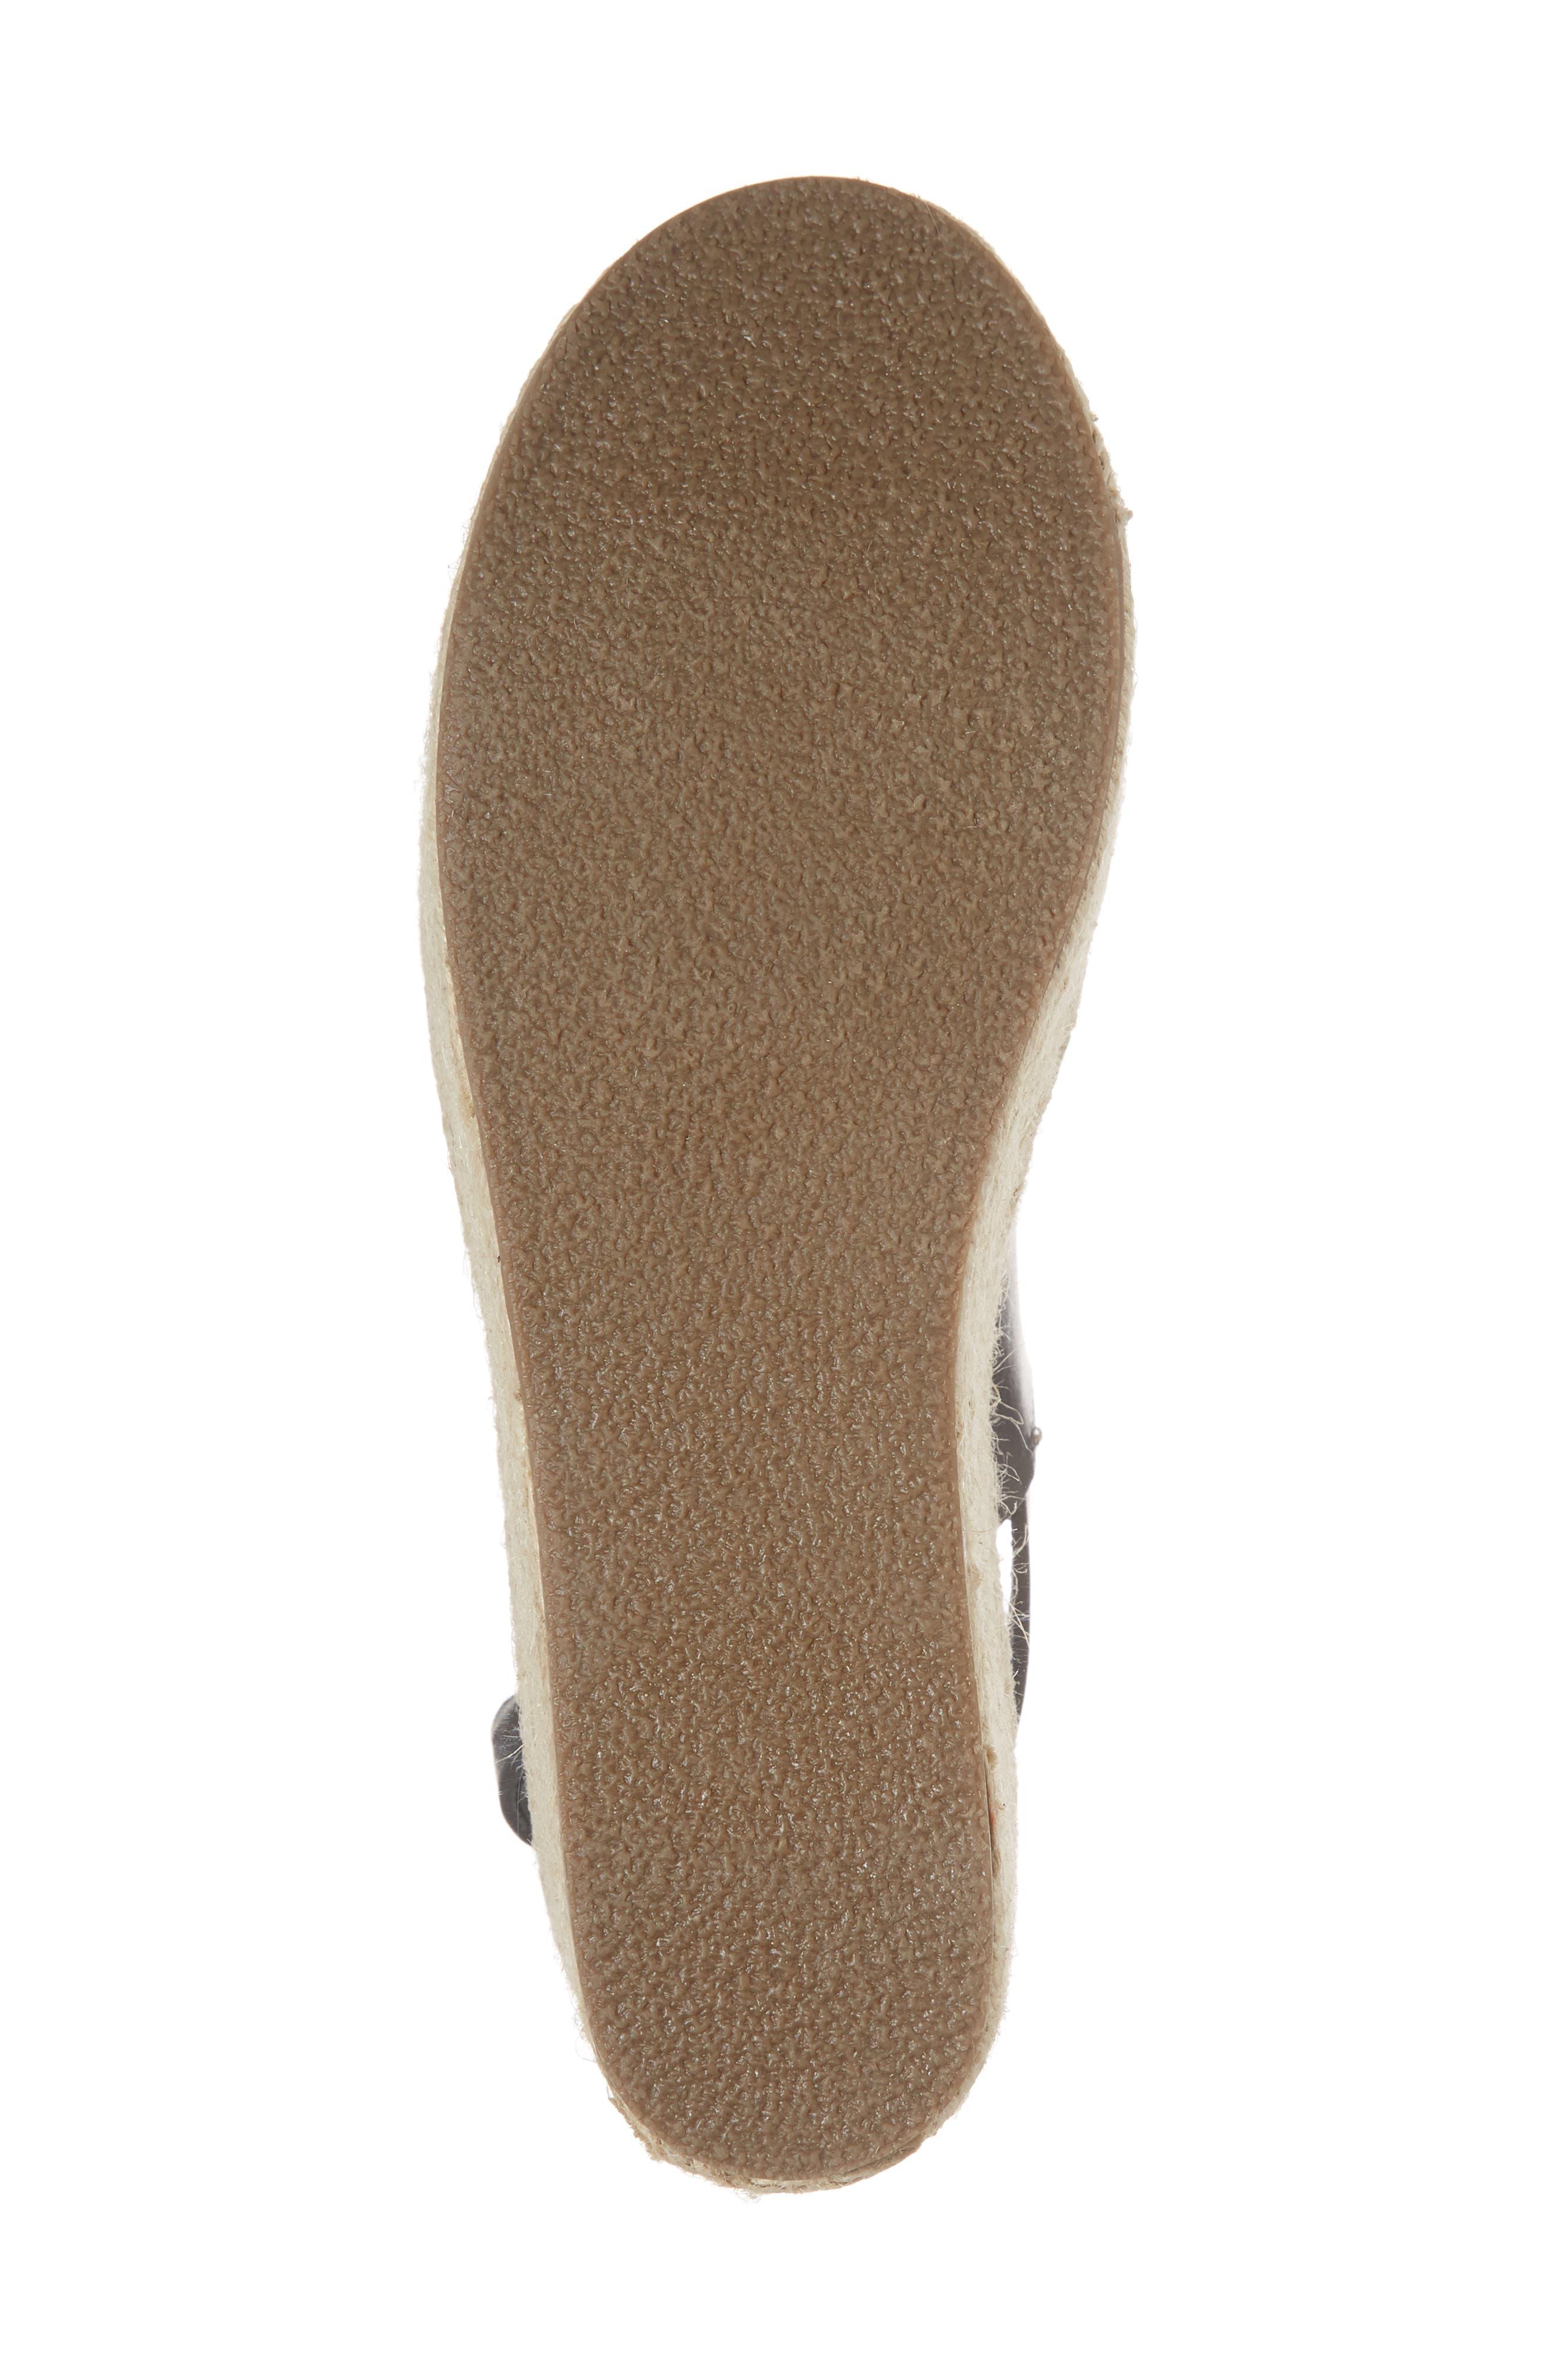 Cali Espadrille Platform Sandal,                             Alternate thumbnail 16, color,